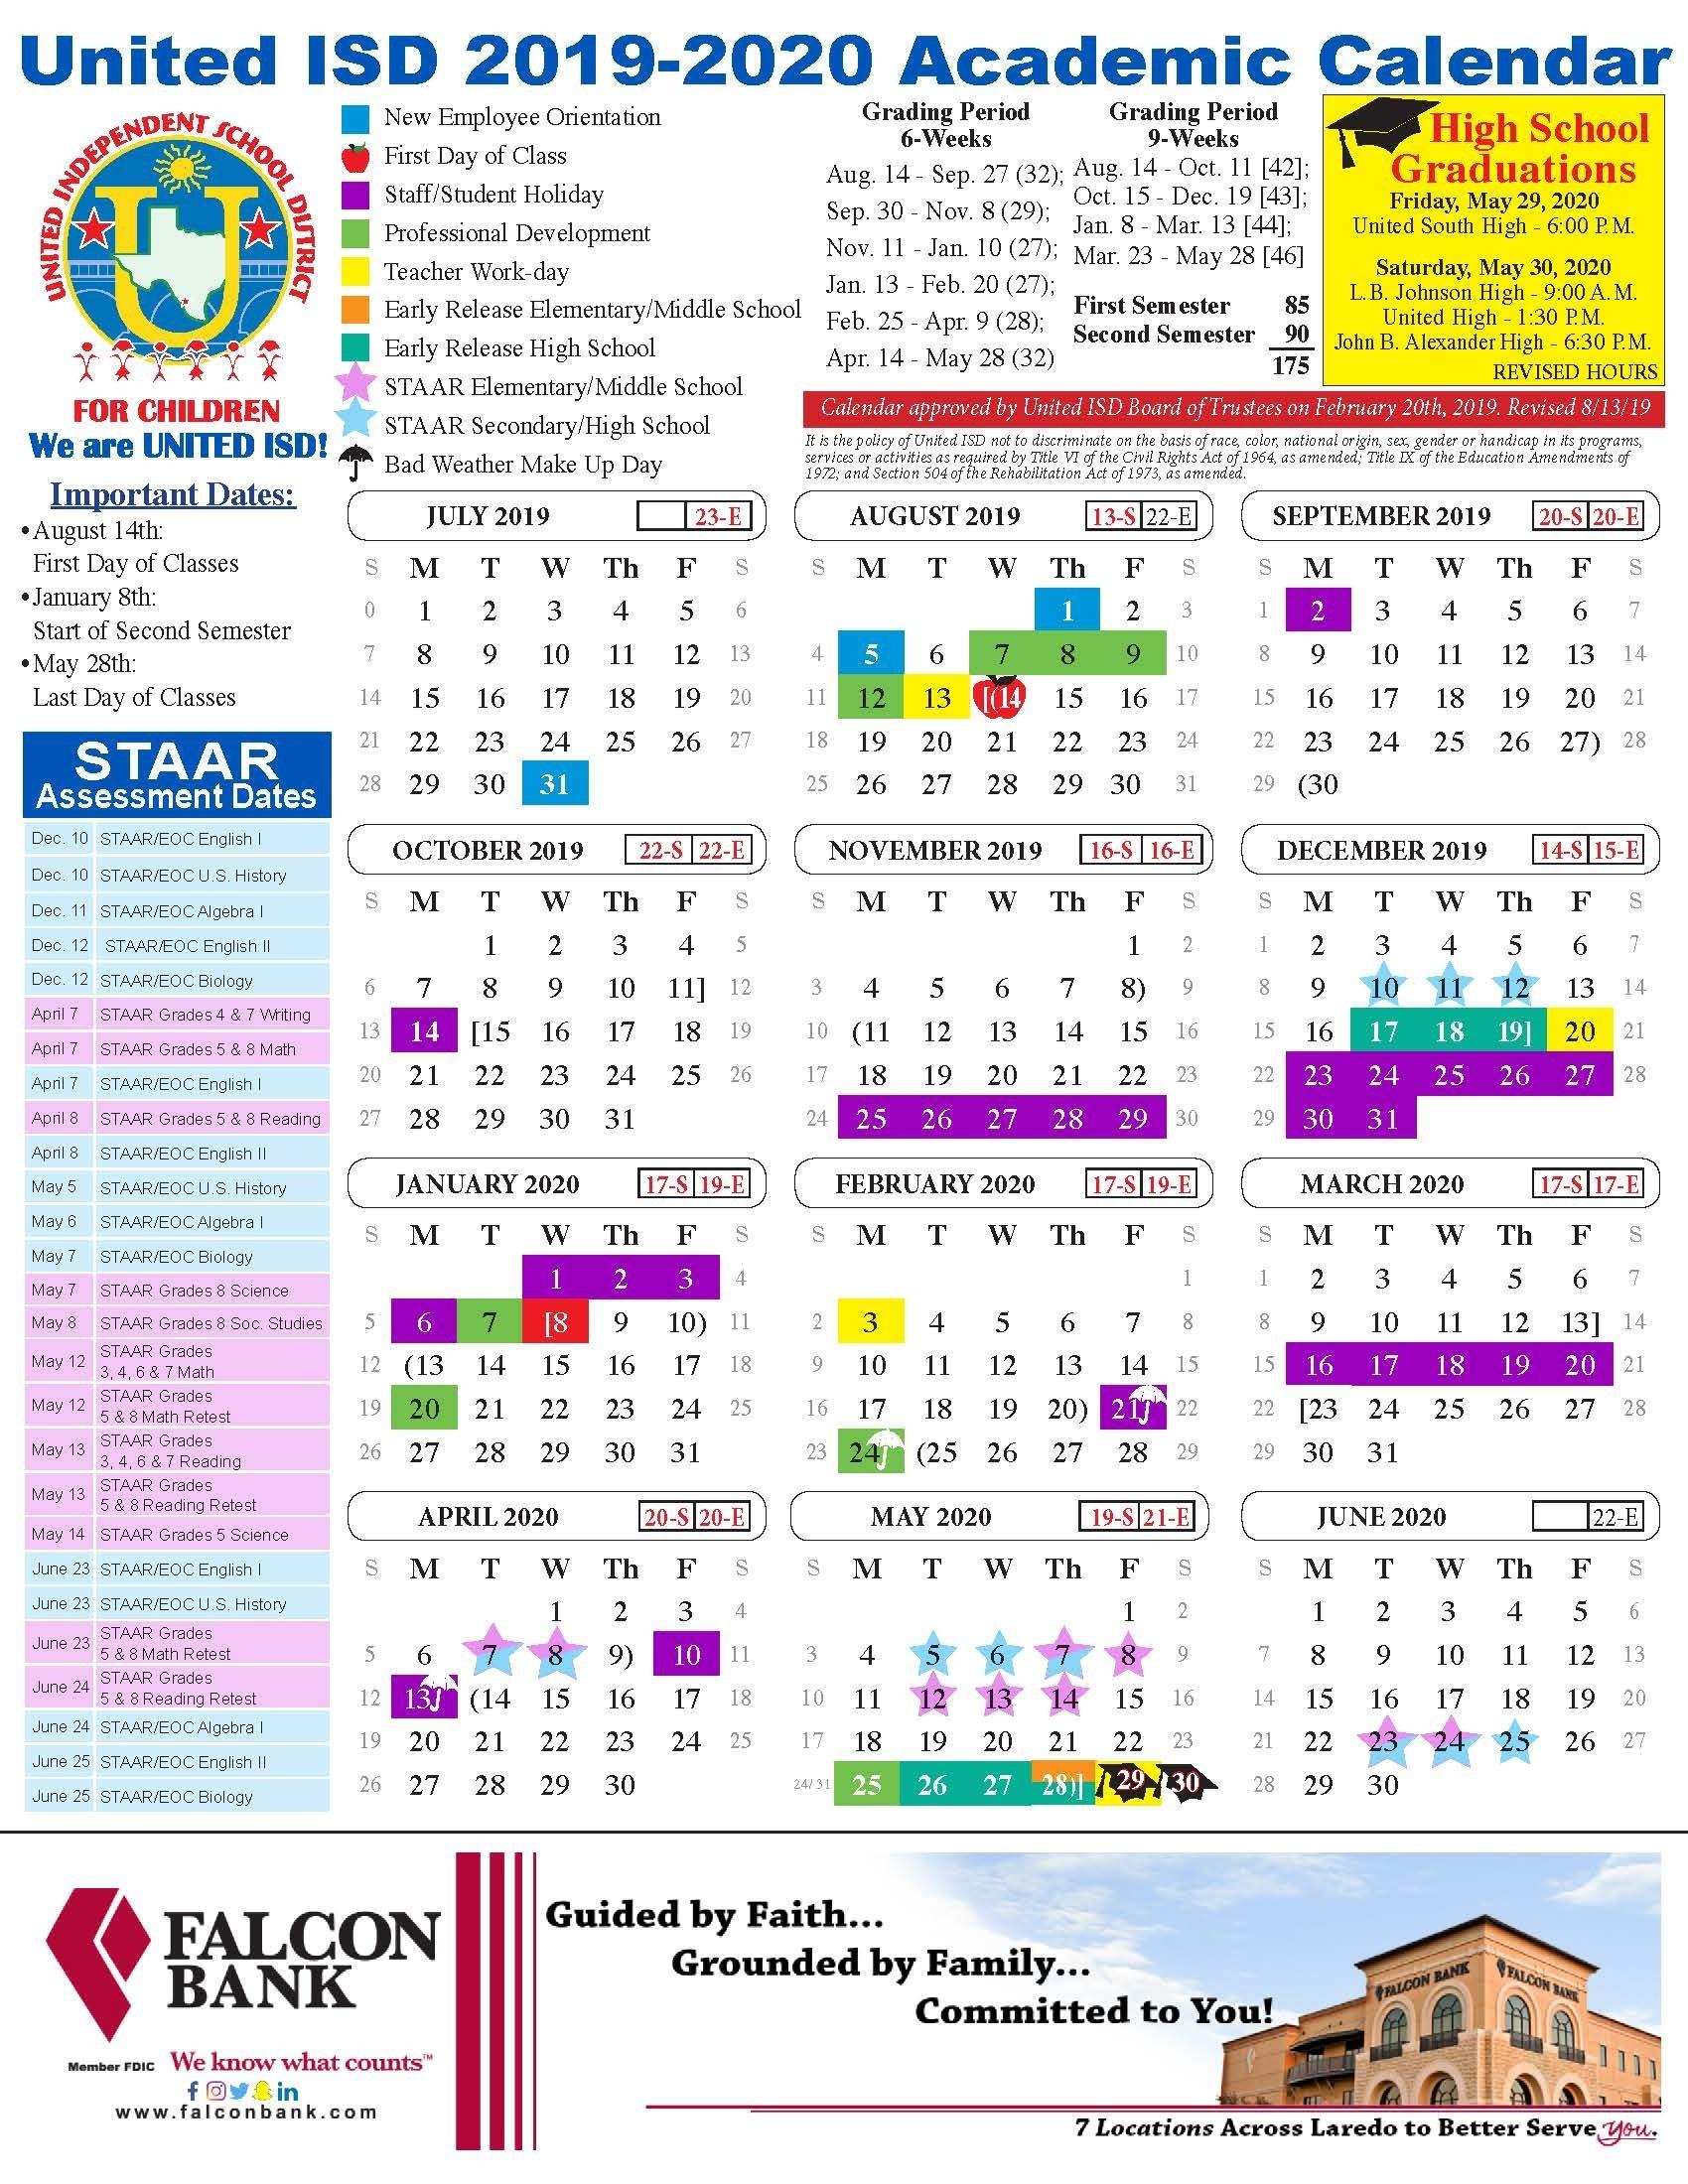 United Isd - Academic Calendar  Date Code Calendar 2020